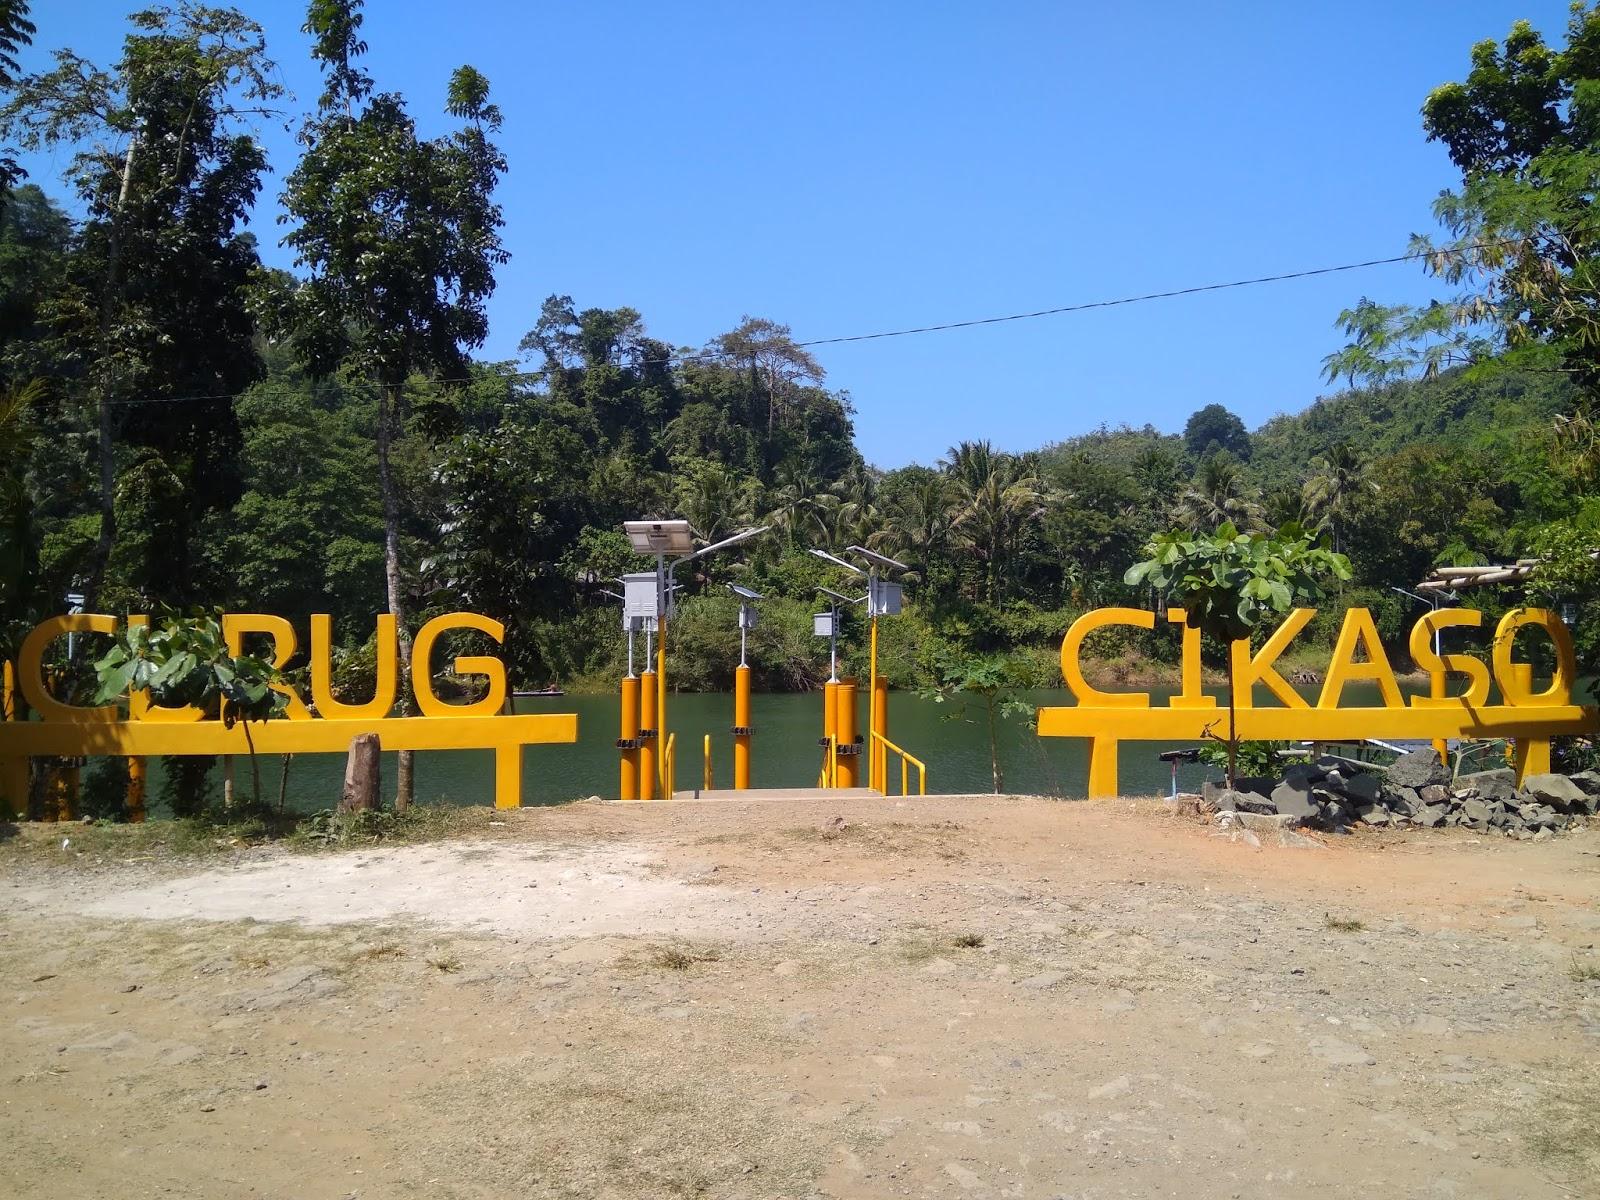 Curug Cikaso Jampang Sukabumi - Info Wisata, Kuliner dan Lifestyle